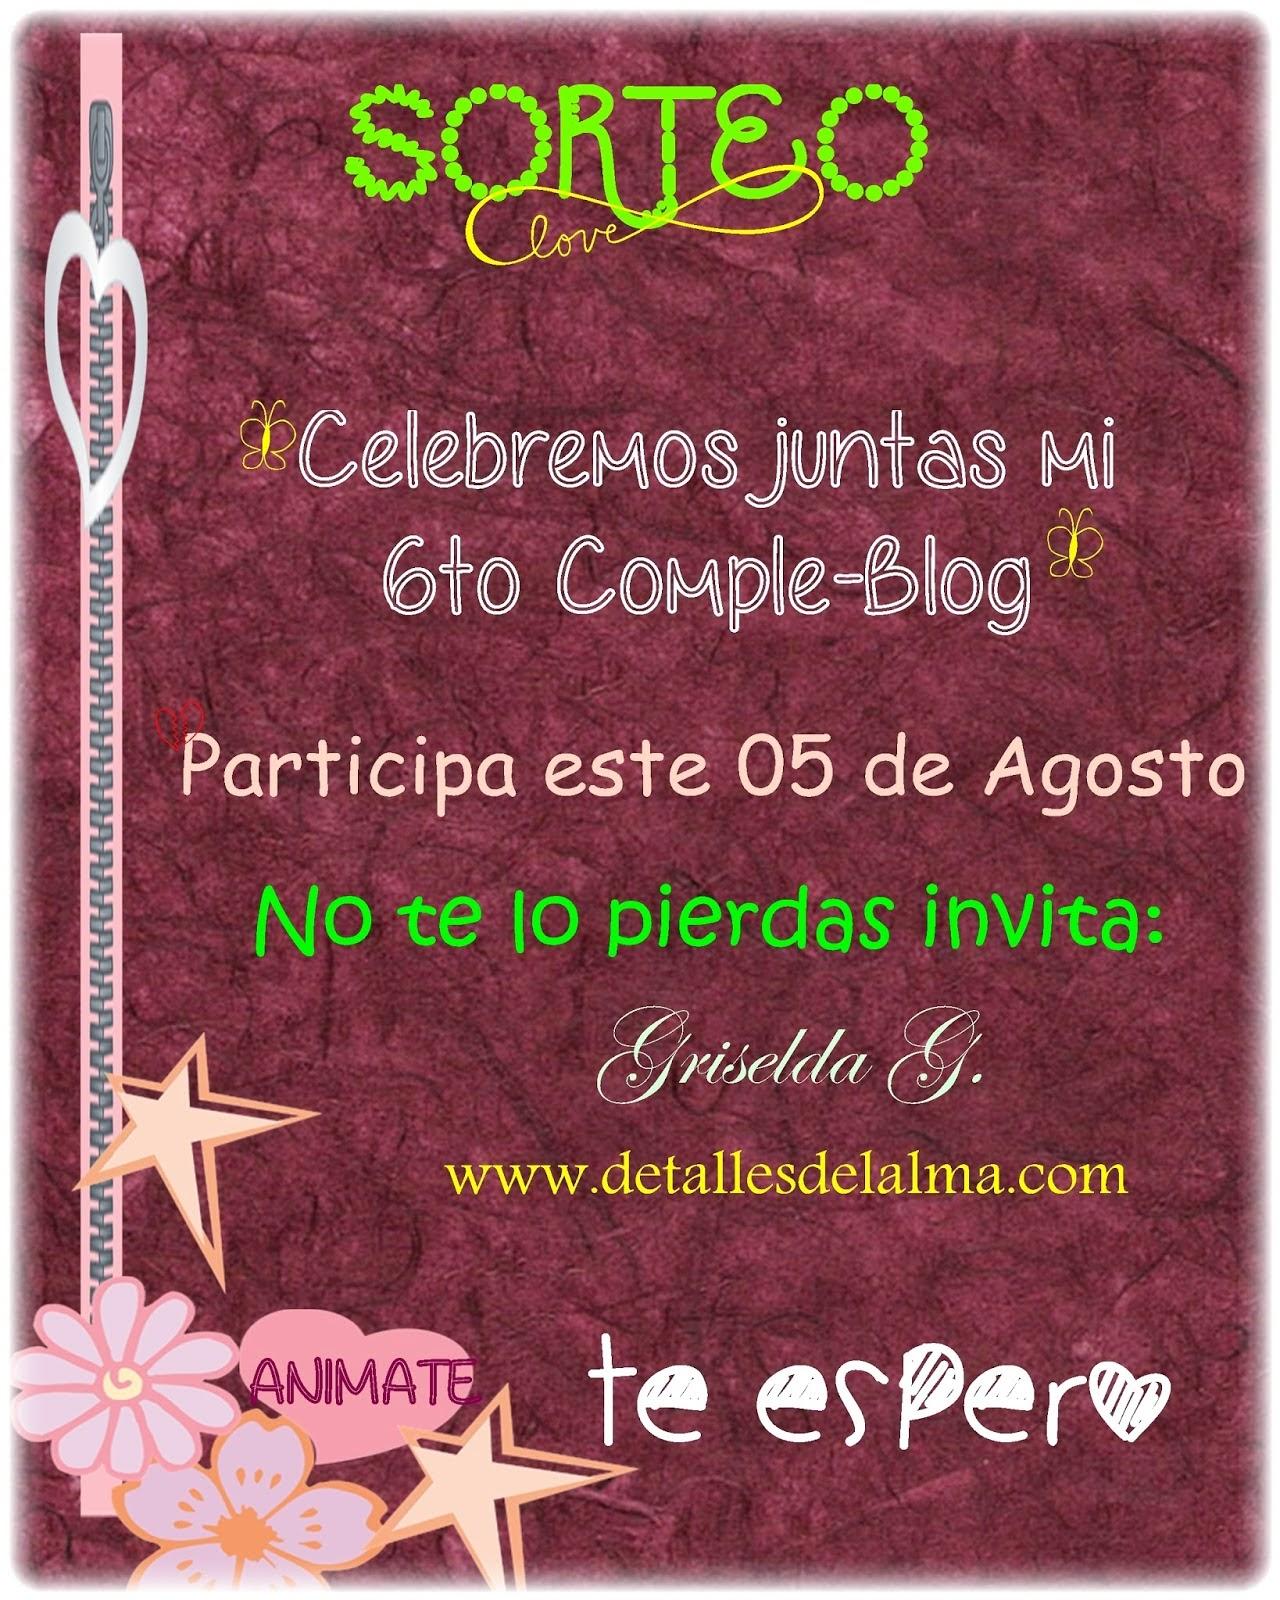 Cumple-blog